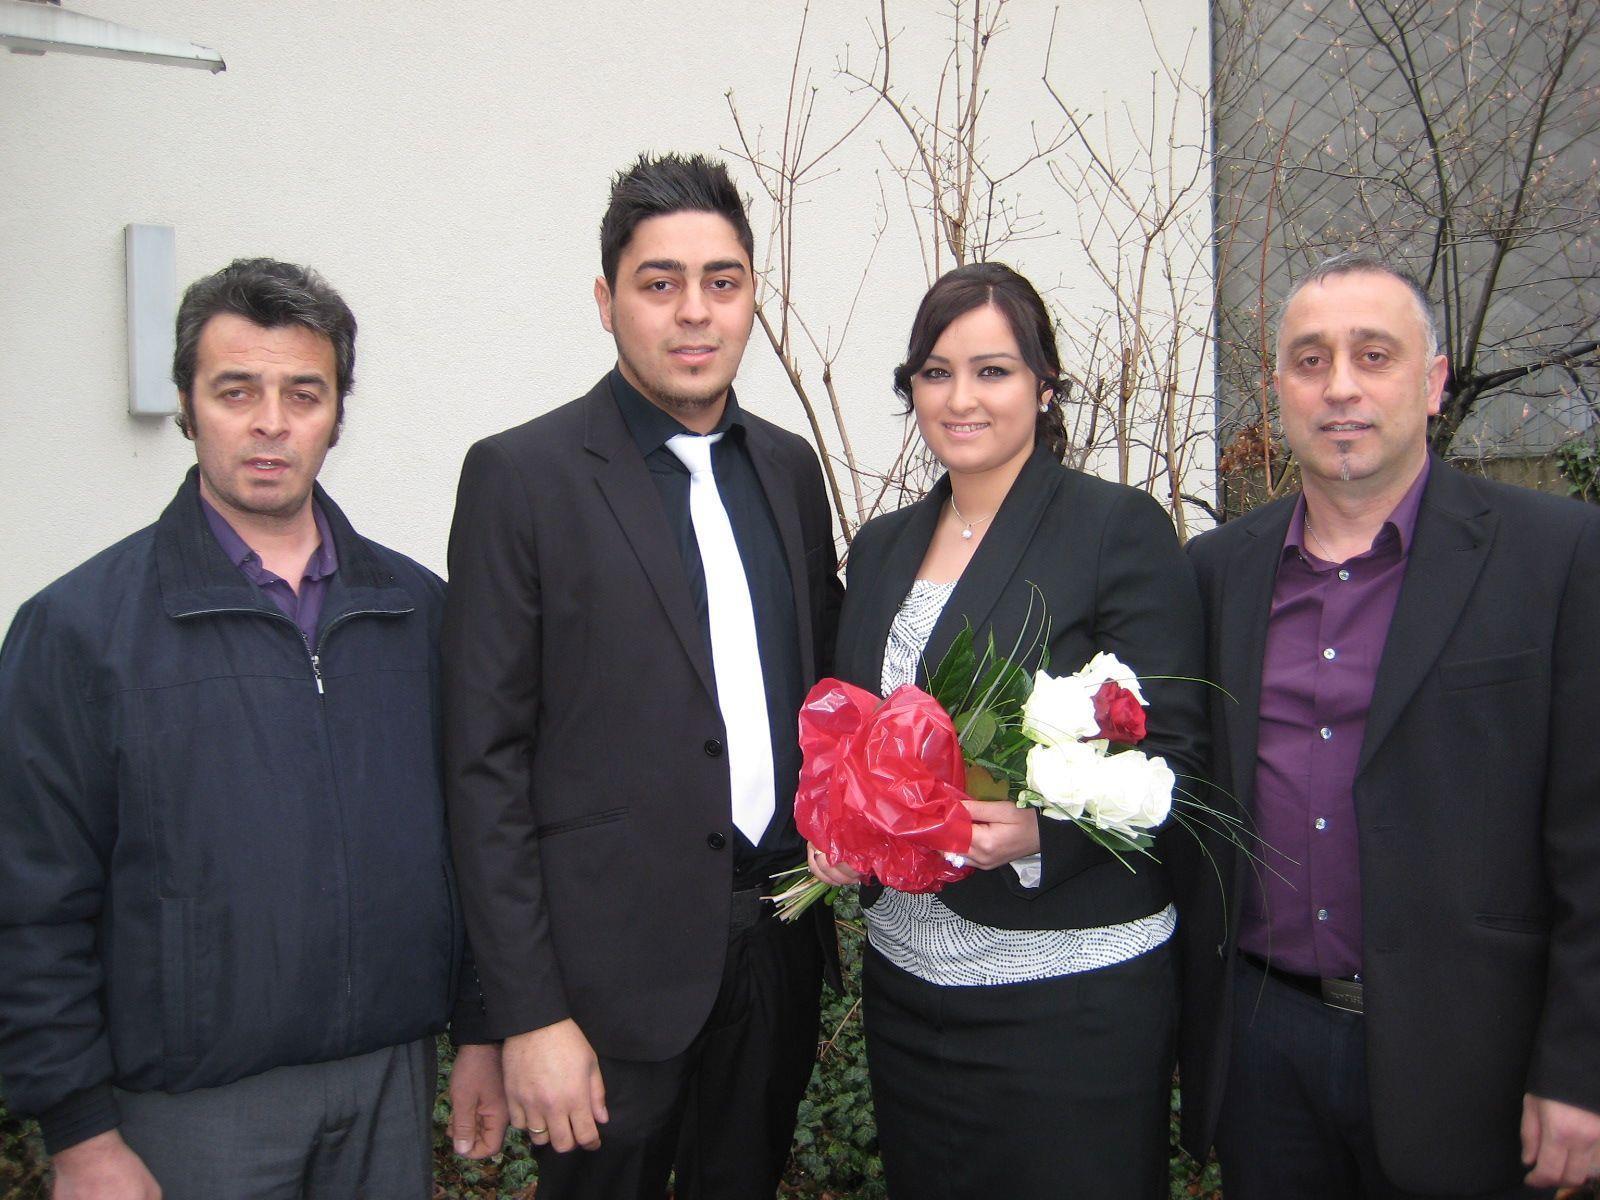 Zeliha Zeyrek und Murat Keklik haben geheiratet.